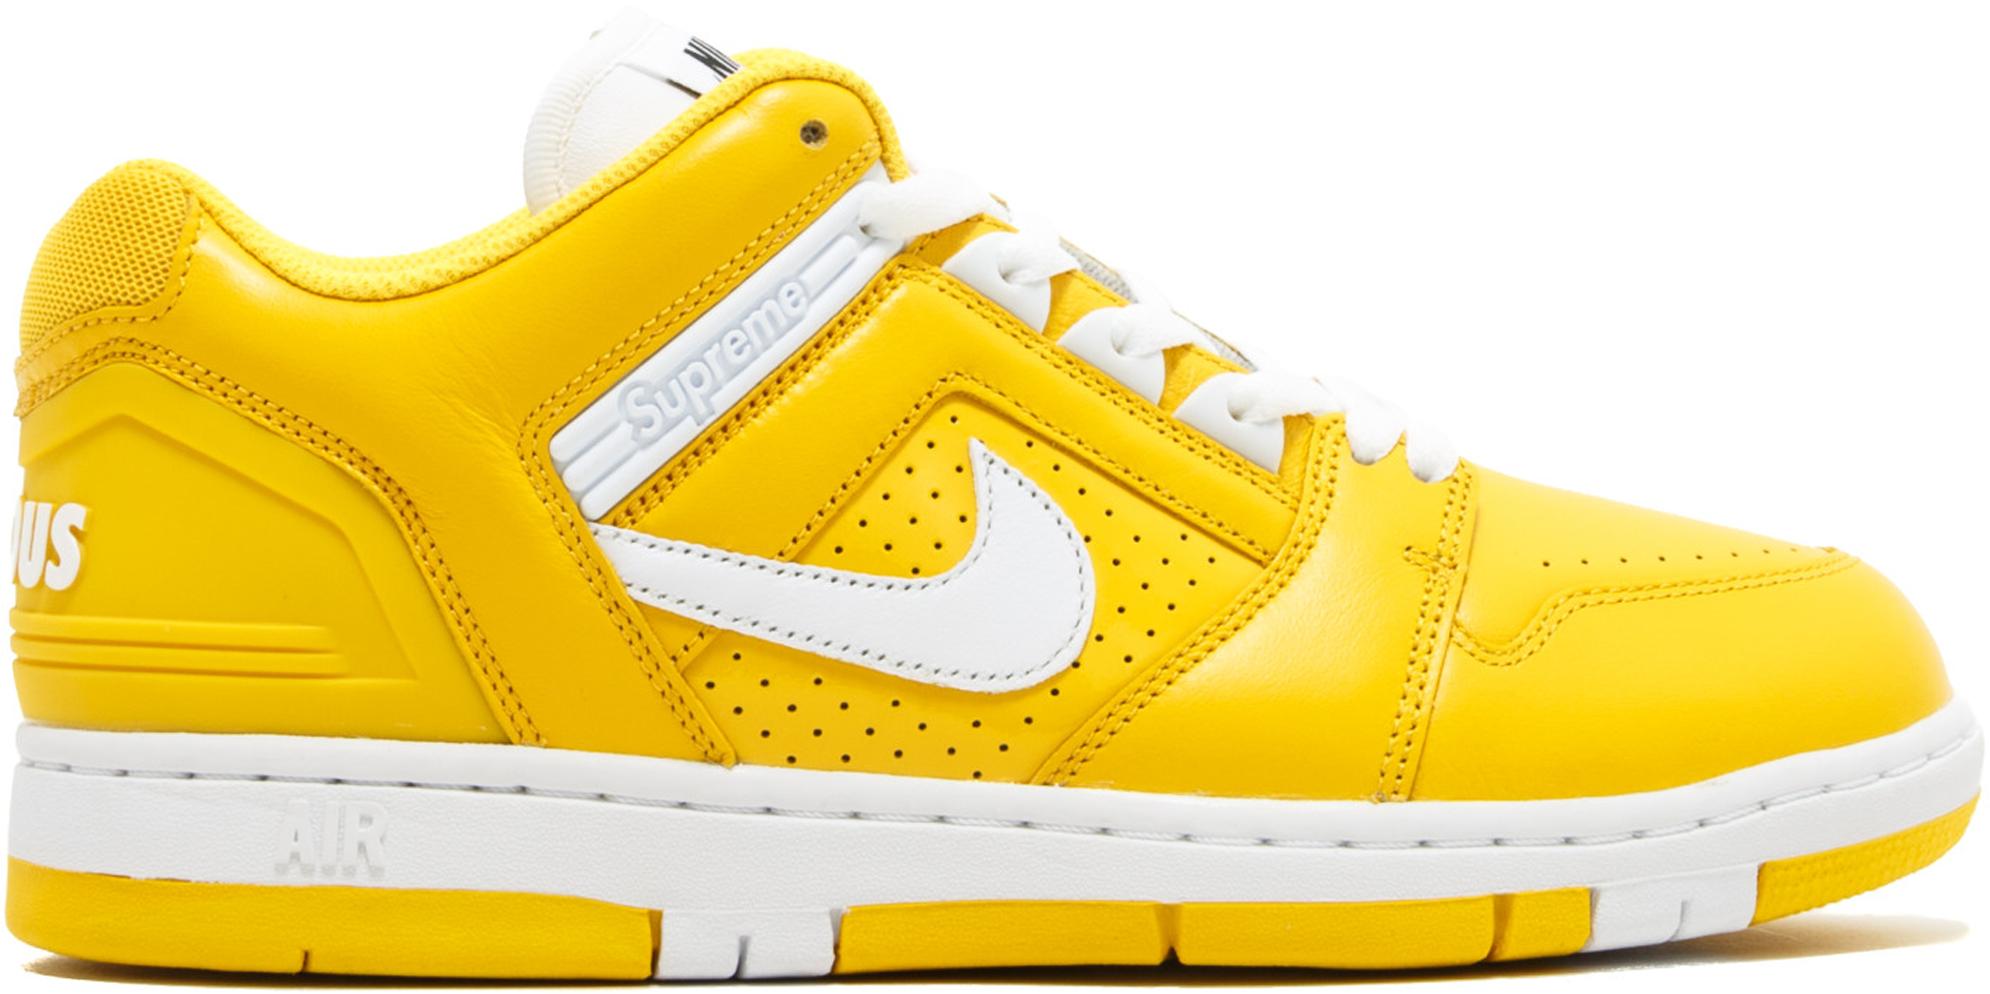 Nike SB Air Force 2 Low Supreme Yellow